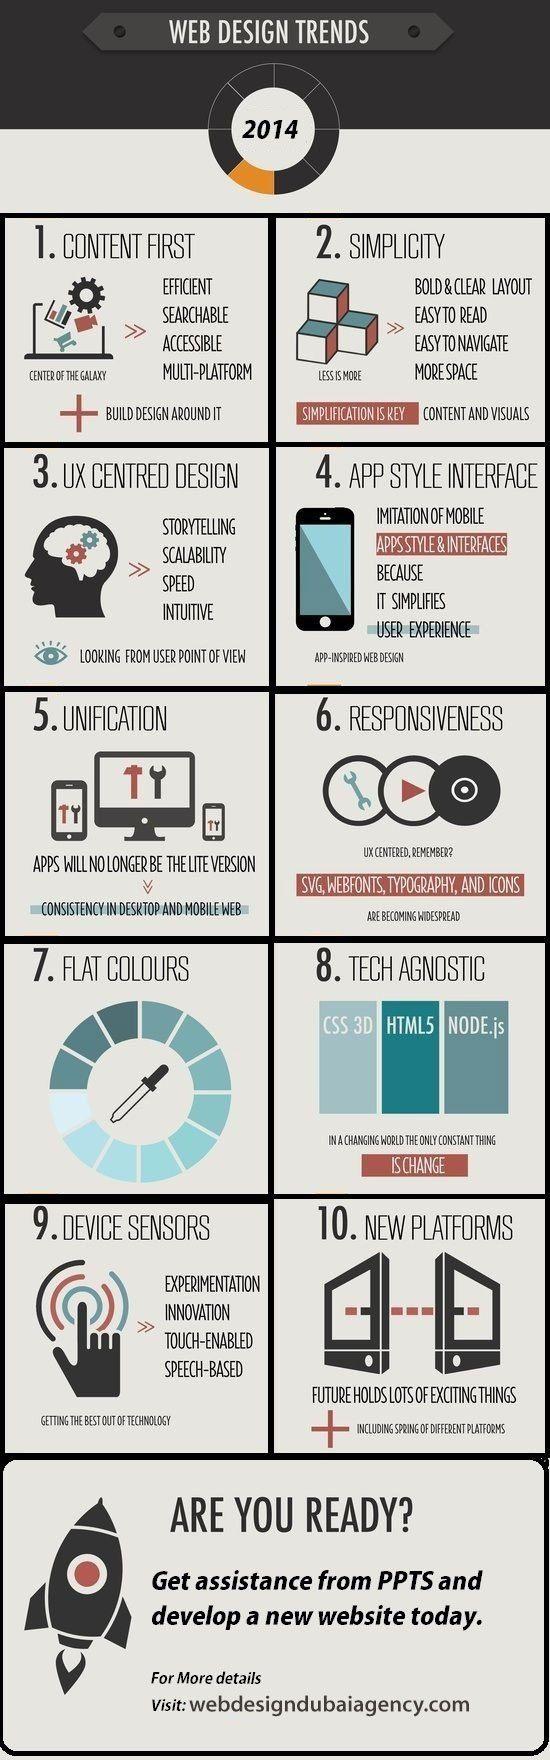 Web design trends 2014 #infographic